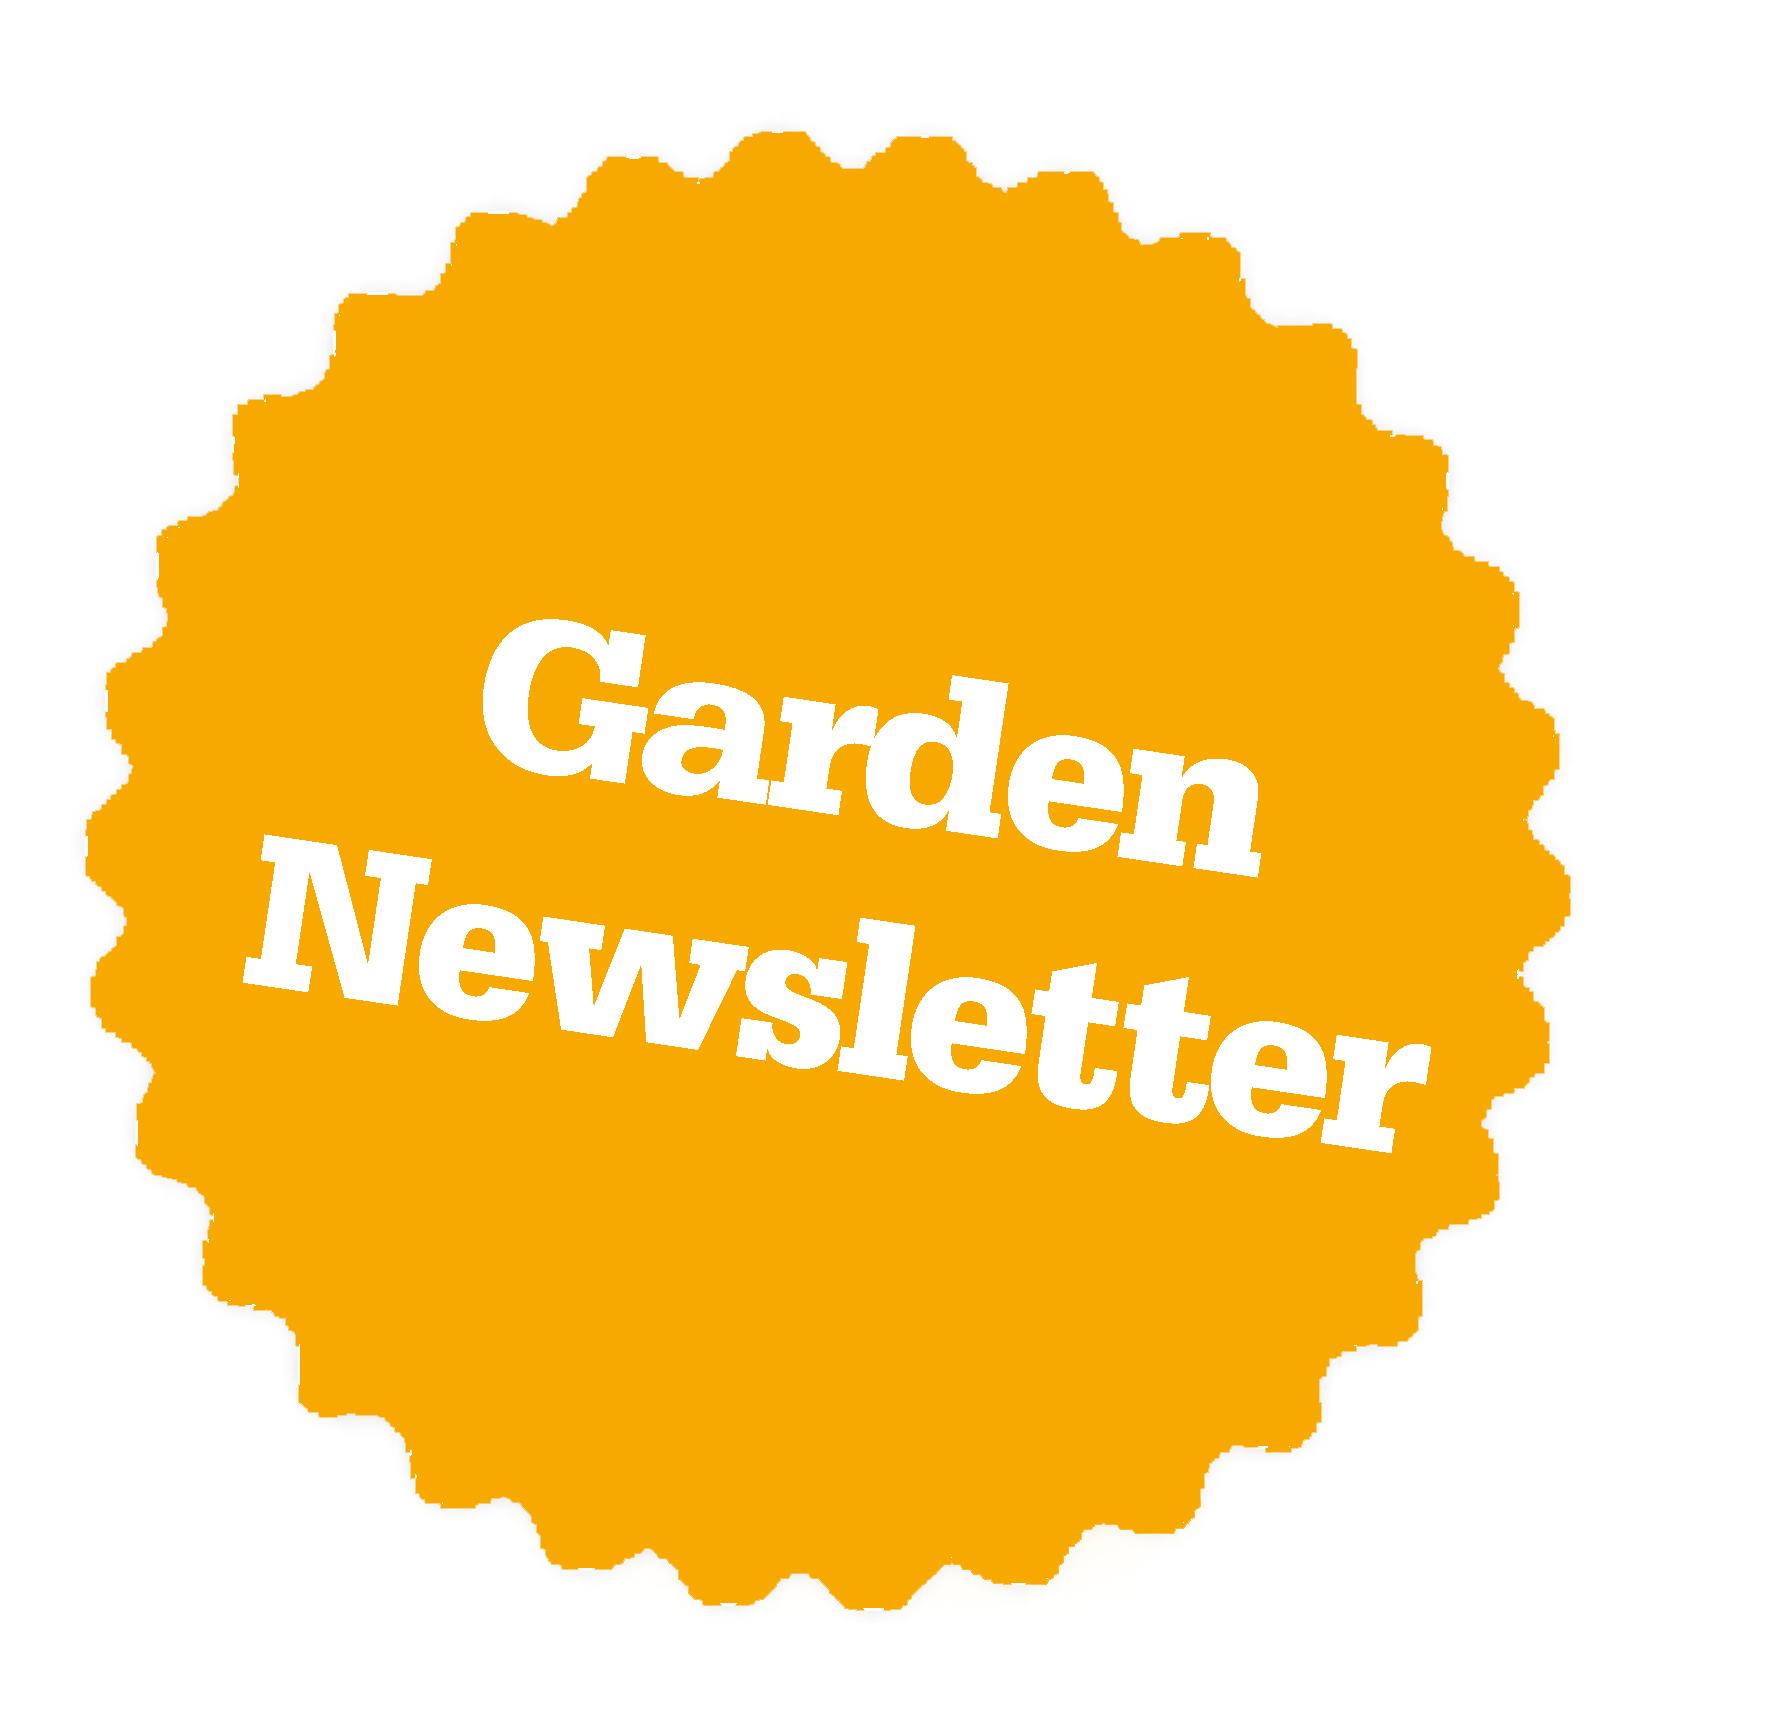 GFG Star_Garden Newsletter_orange